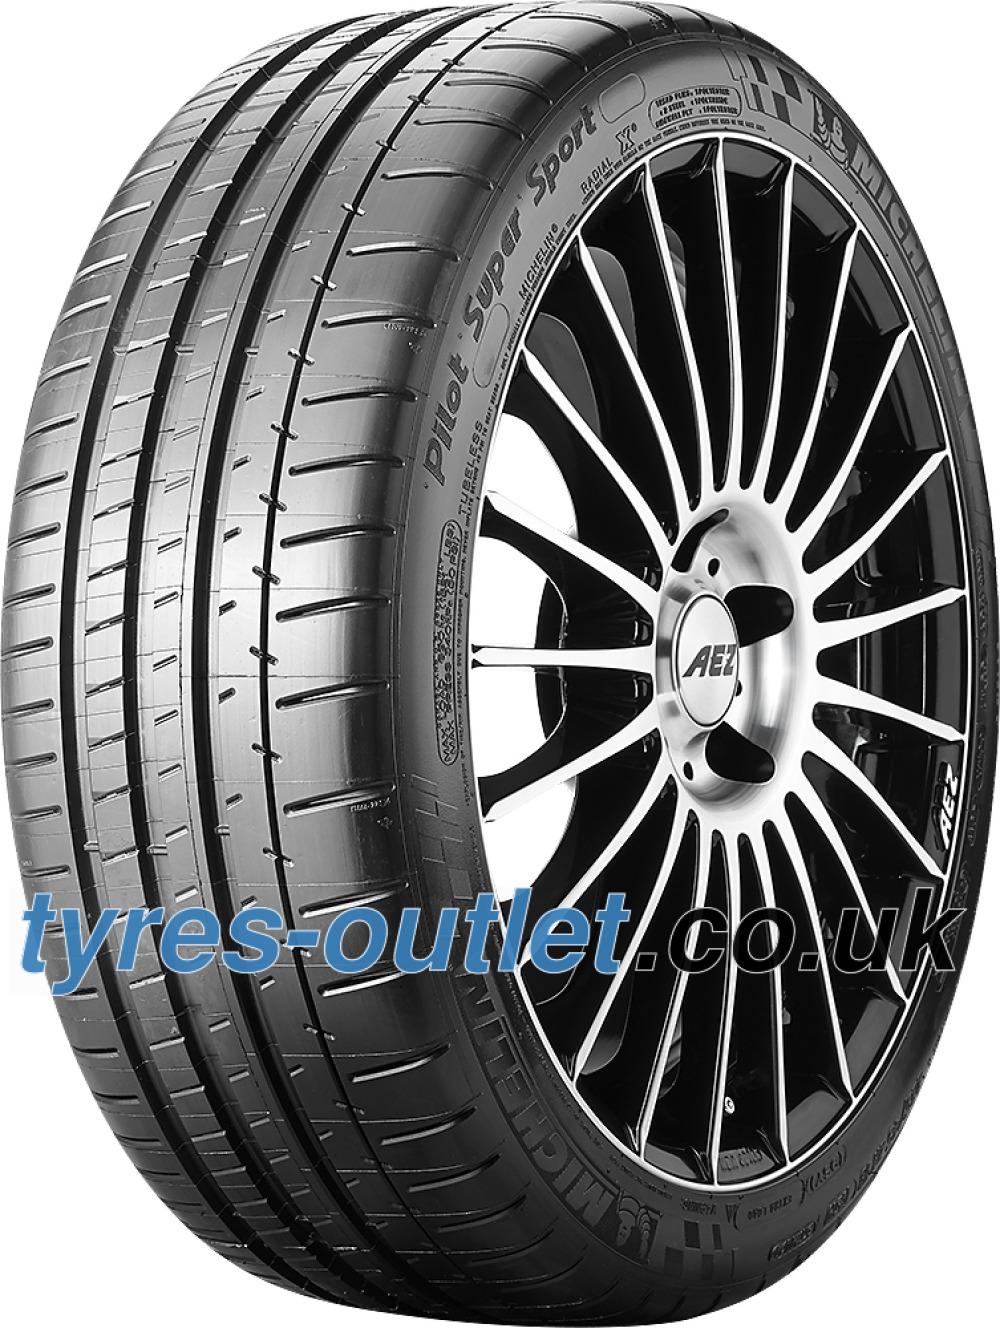 Michelin Pilot Super Sport ( 245/35 ZR21 (96Y) XL with rim protection ridge (FSL) )